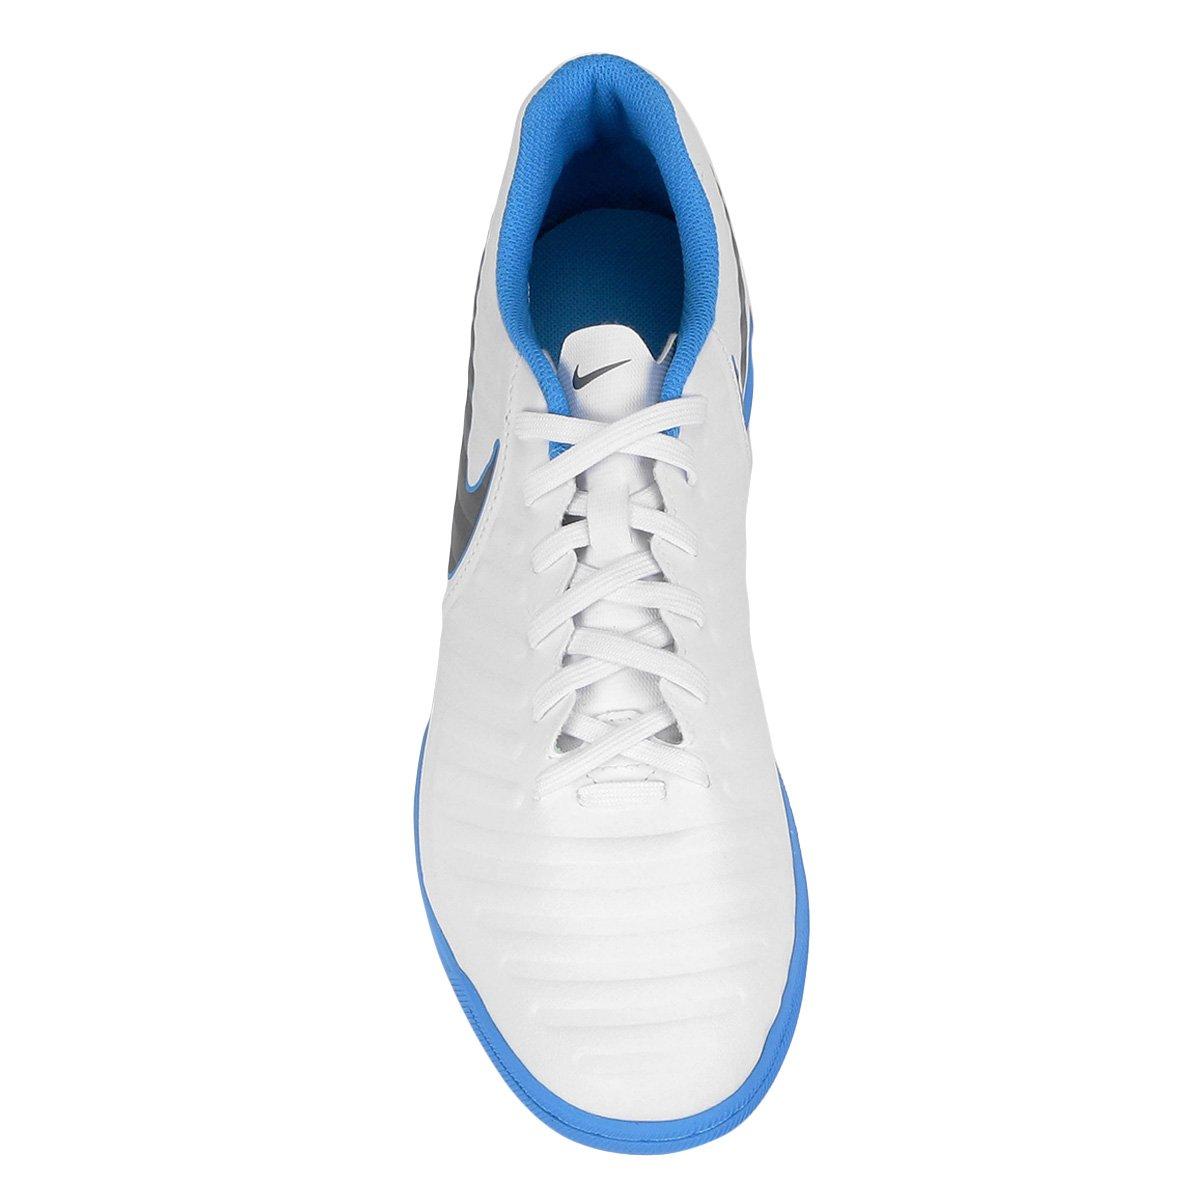 Chuteira Nike Tiempo LegendX 7 Club IC White/Mtlc Cool Grey – Blue Hero